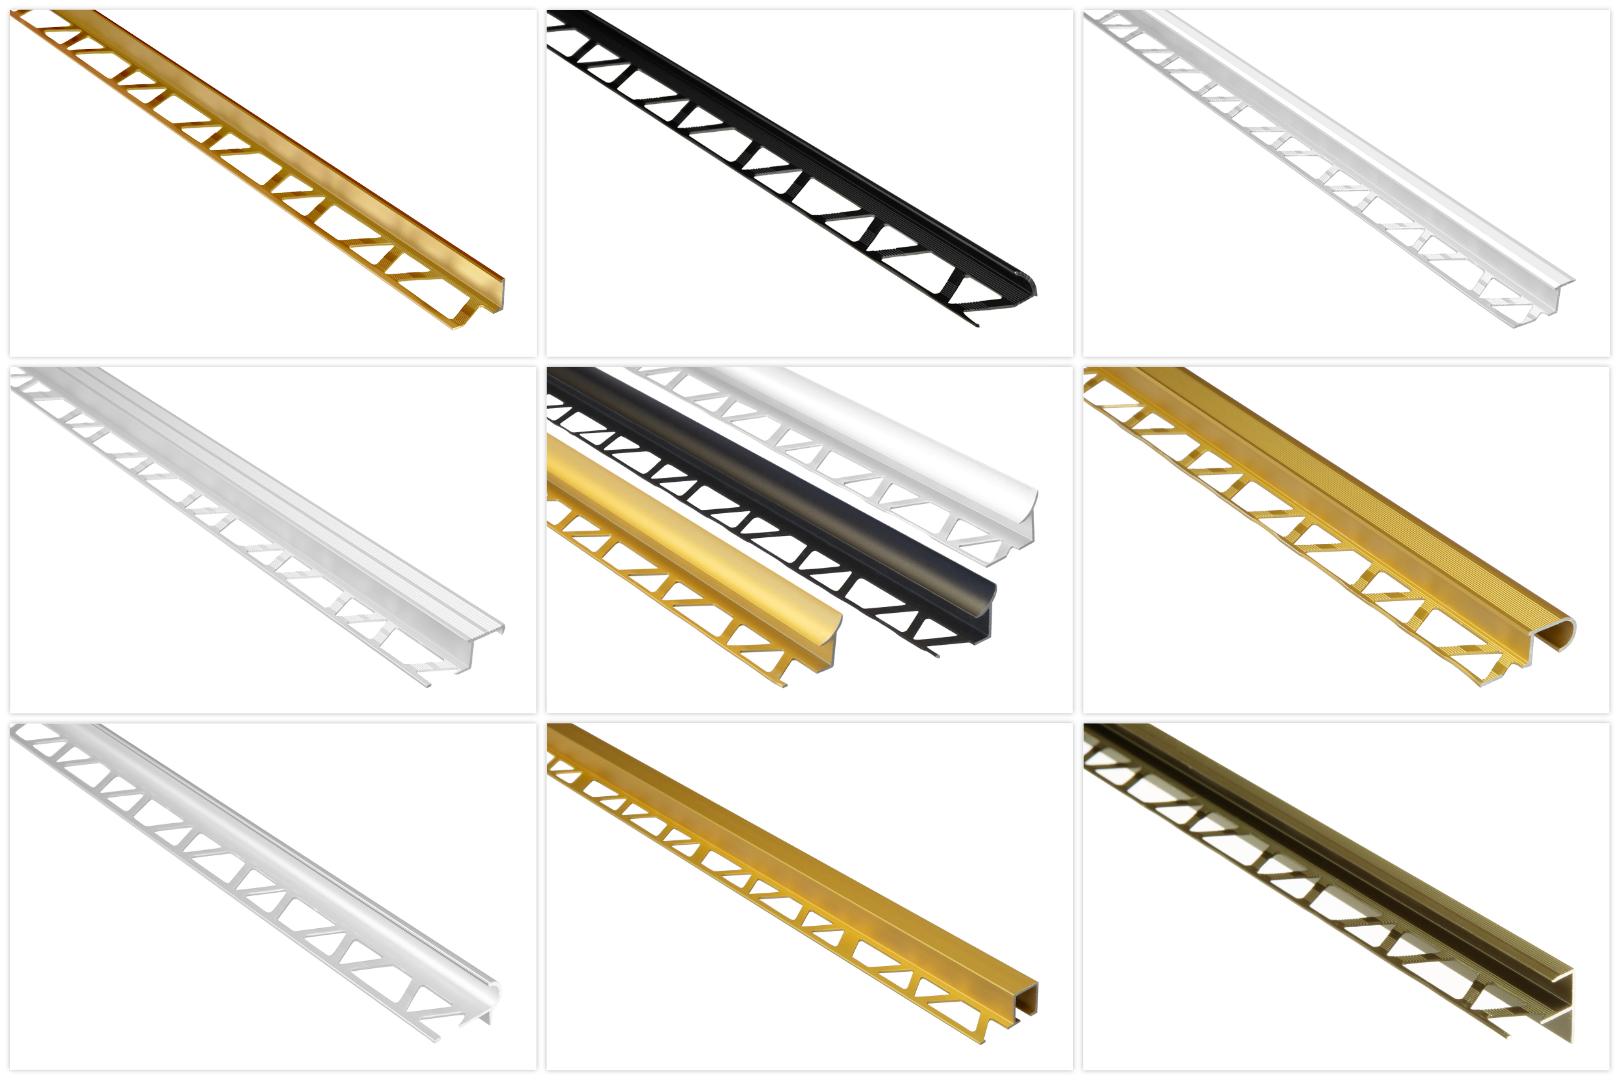 Fliesenschienen aus Aluminium, langlebig & rostfrei als Kantenschutz, Abschluss & Dekoration